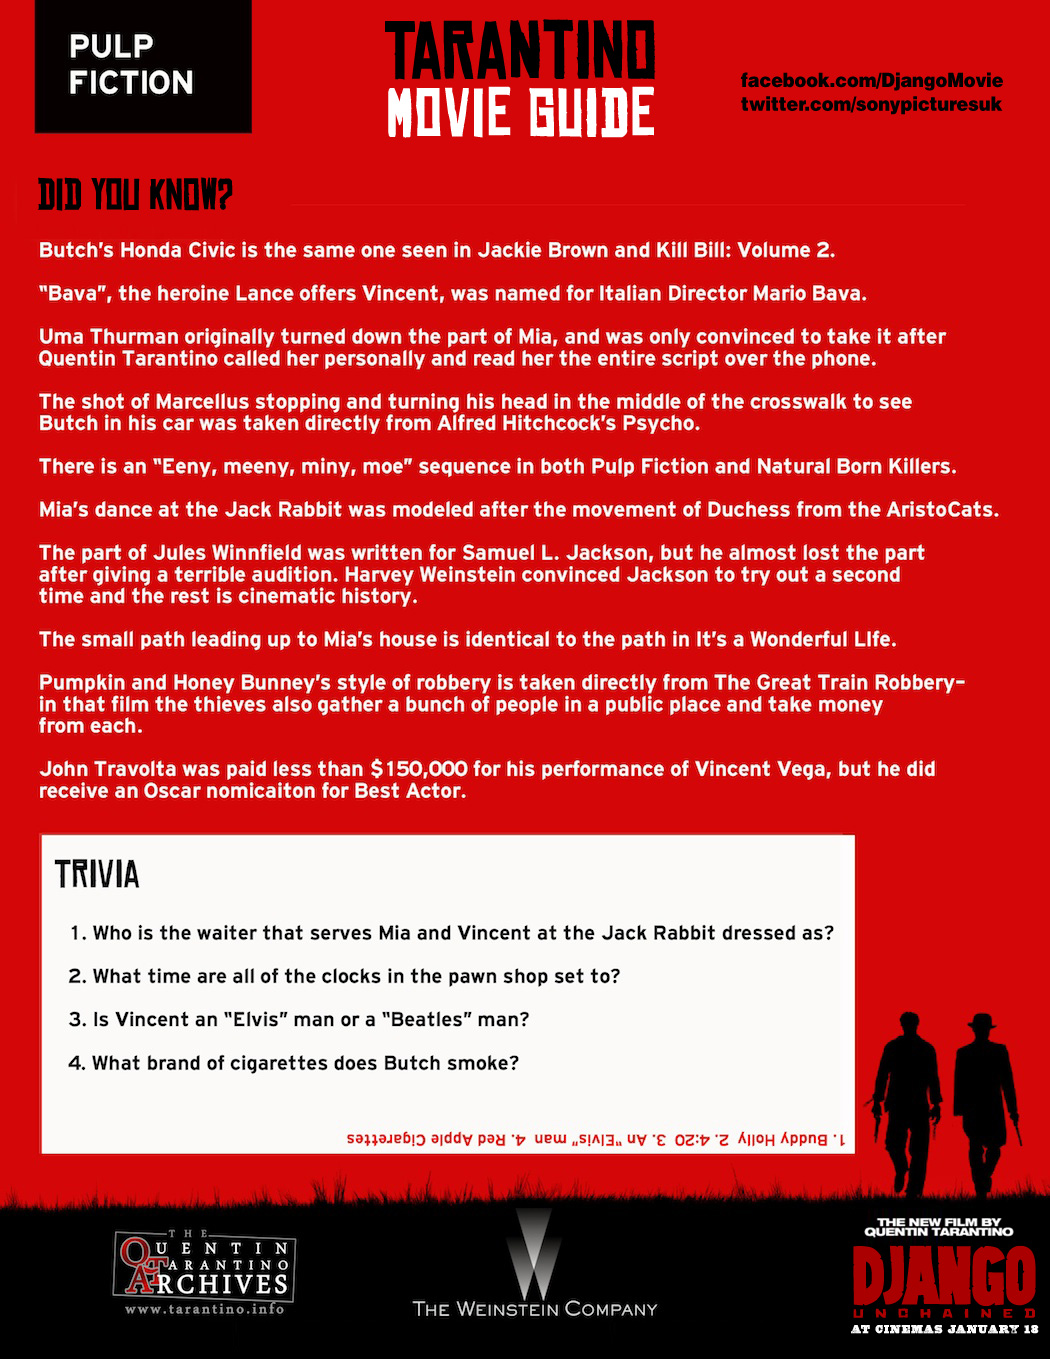 Tarantino Movie Guide - Pulp Fiction